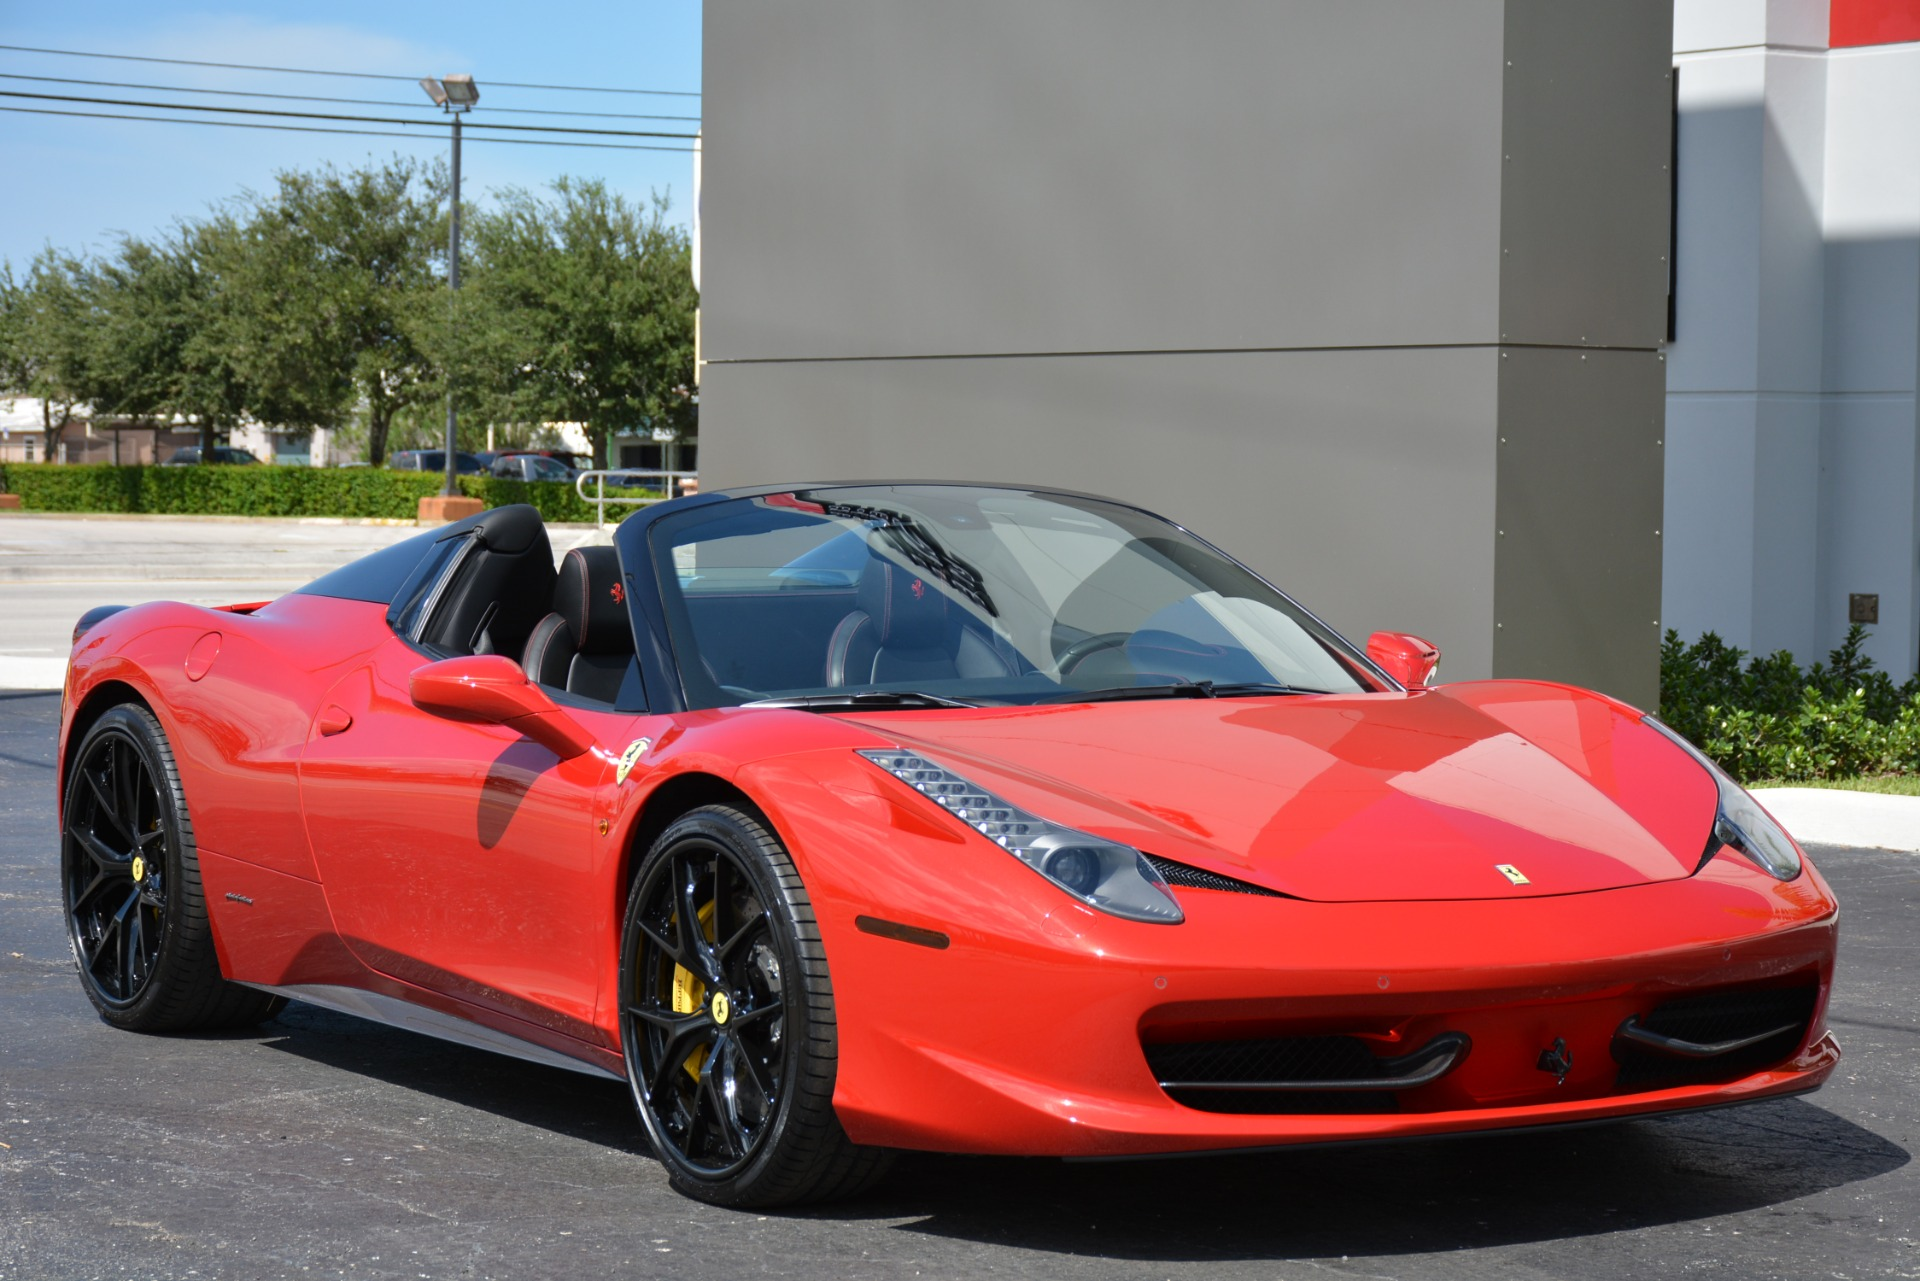 Used 2015 Ferrari 458 Spider For Sale ($224,900) | Marino ...  Ferrari 458 Spider Red